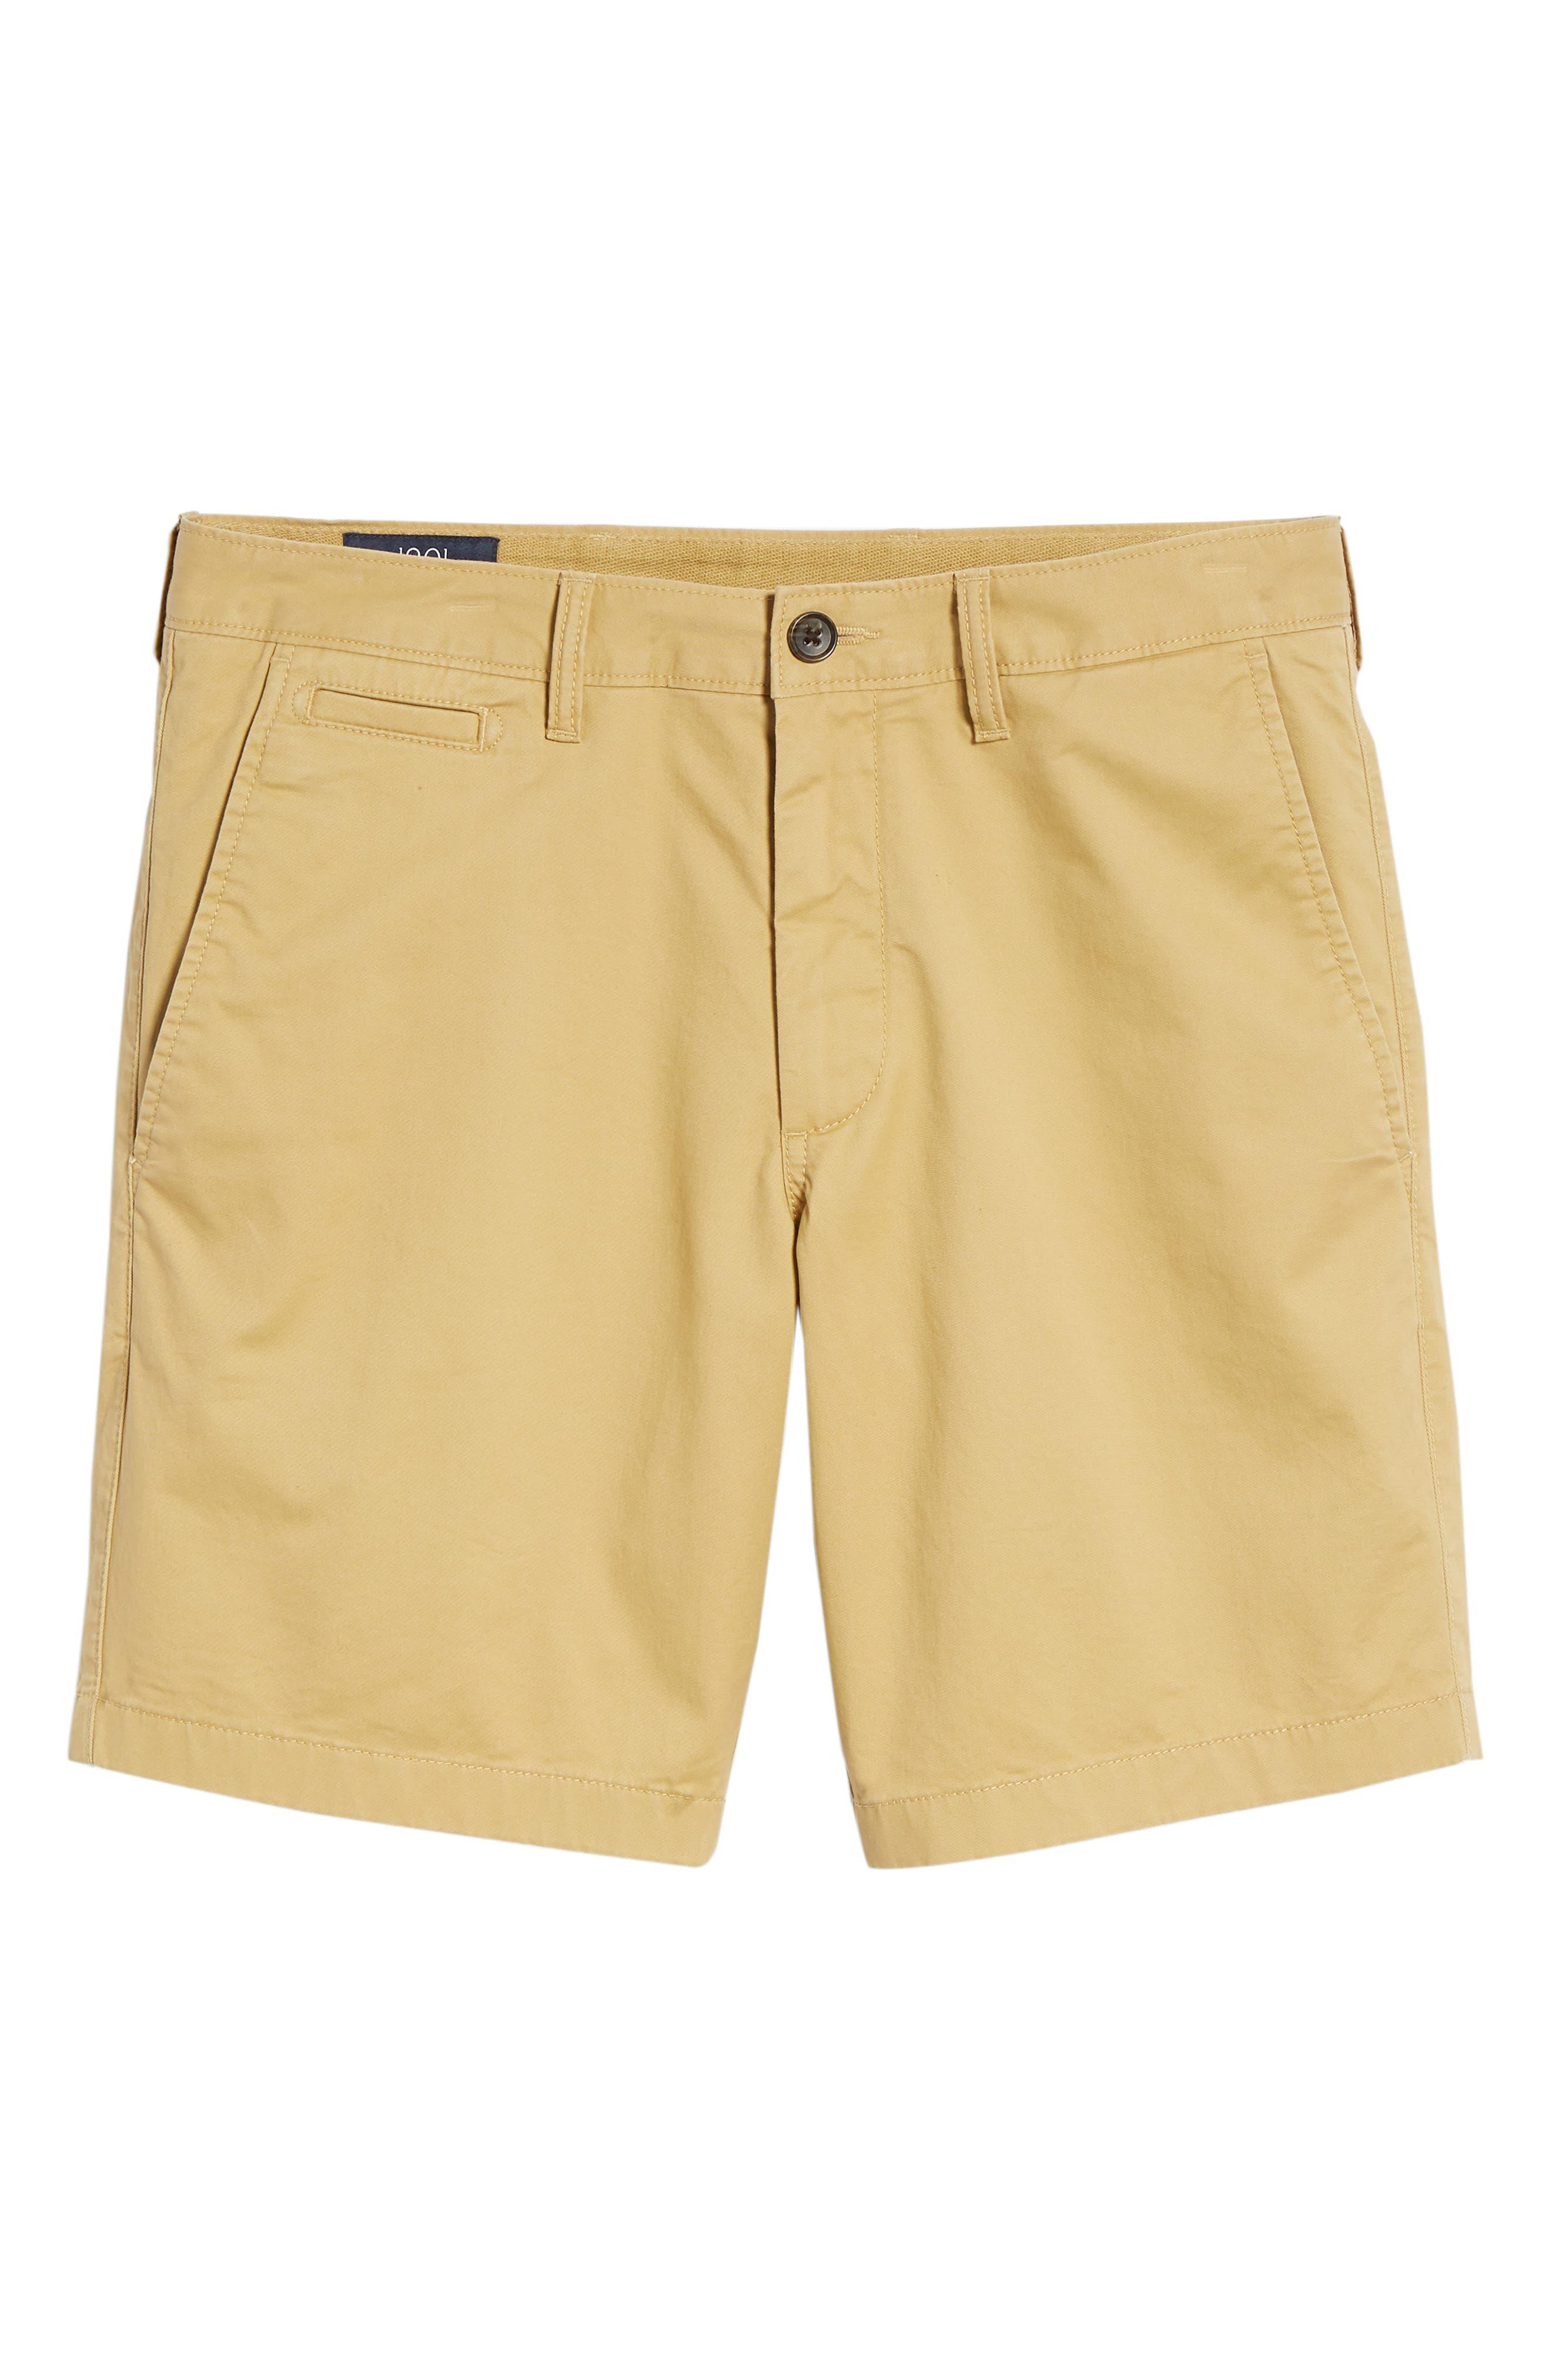 Ballard Slim Fit Stretch Chino 9-Inch Shorts,                             Alternate thumbnail 6, color,                             TAN LARK